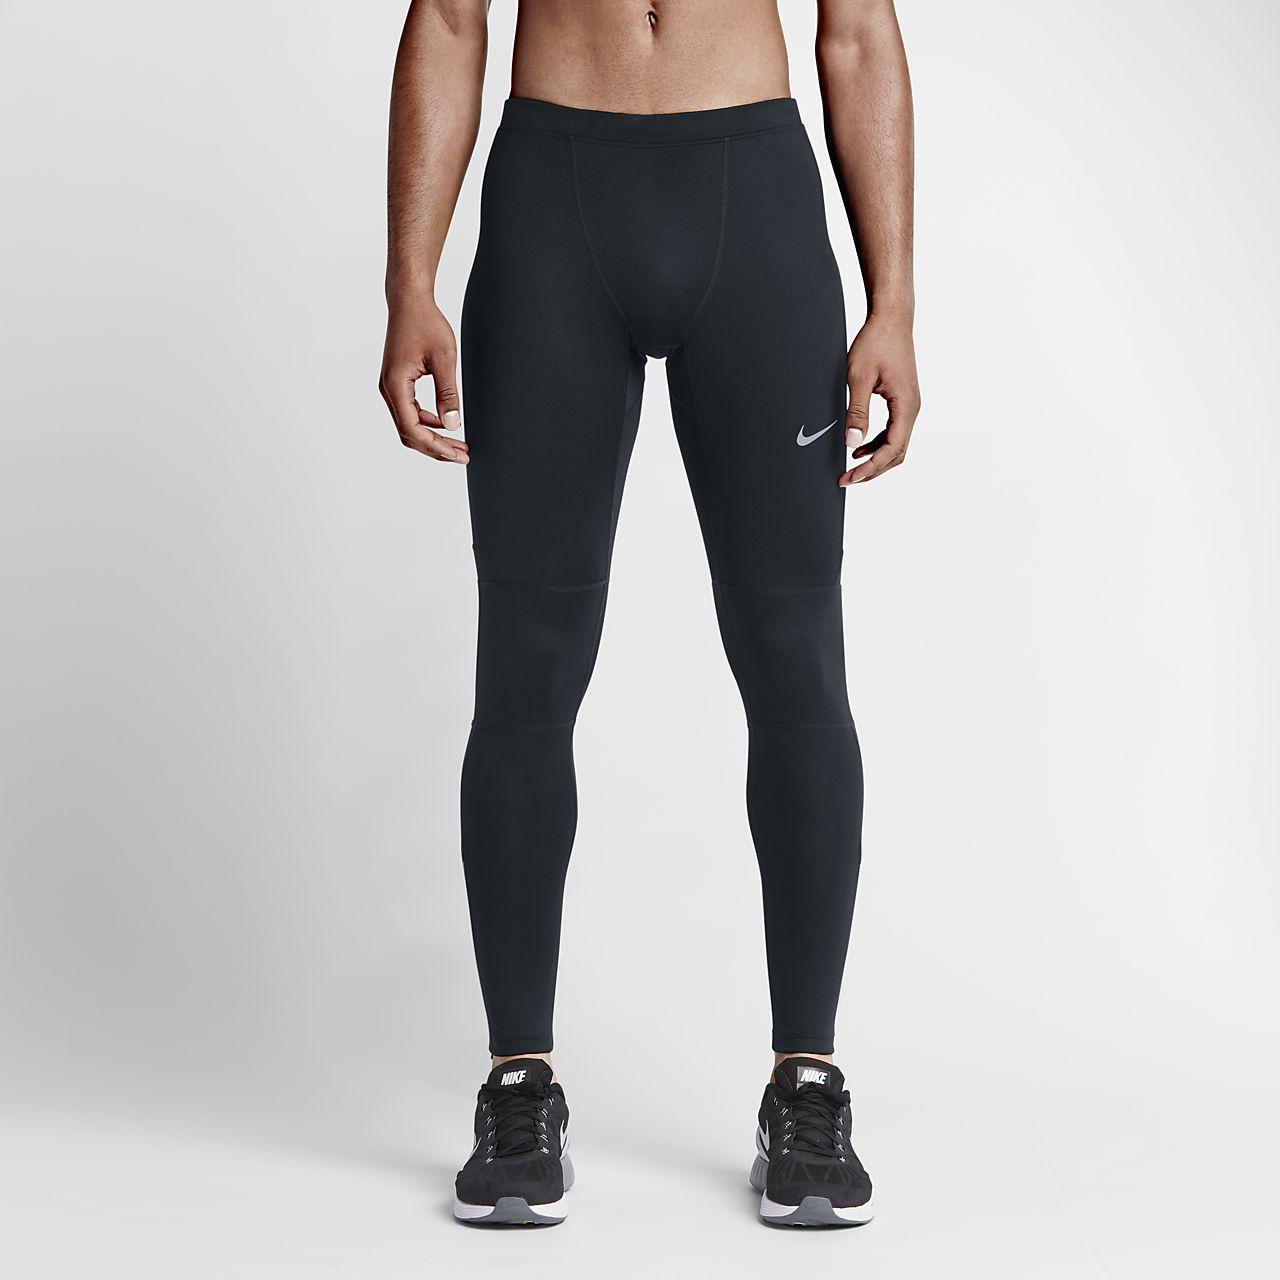 Nike Power Essential Men's Running Tights Black